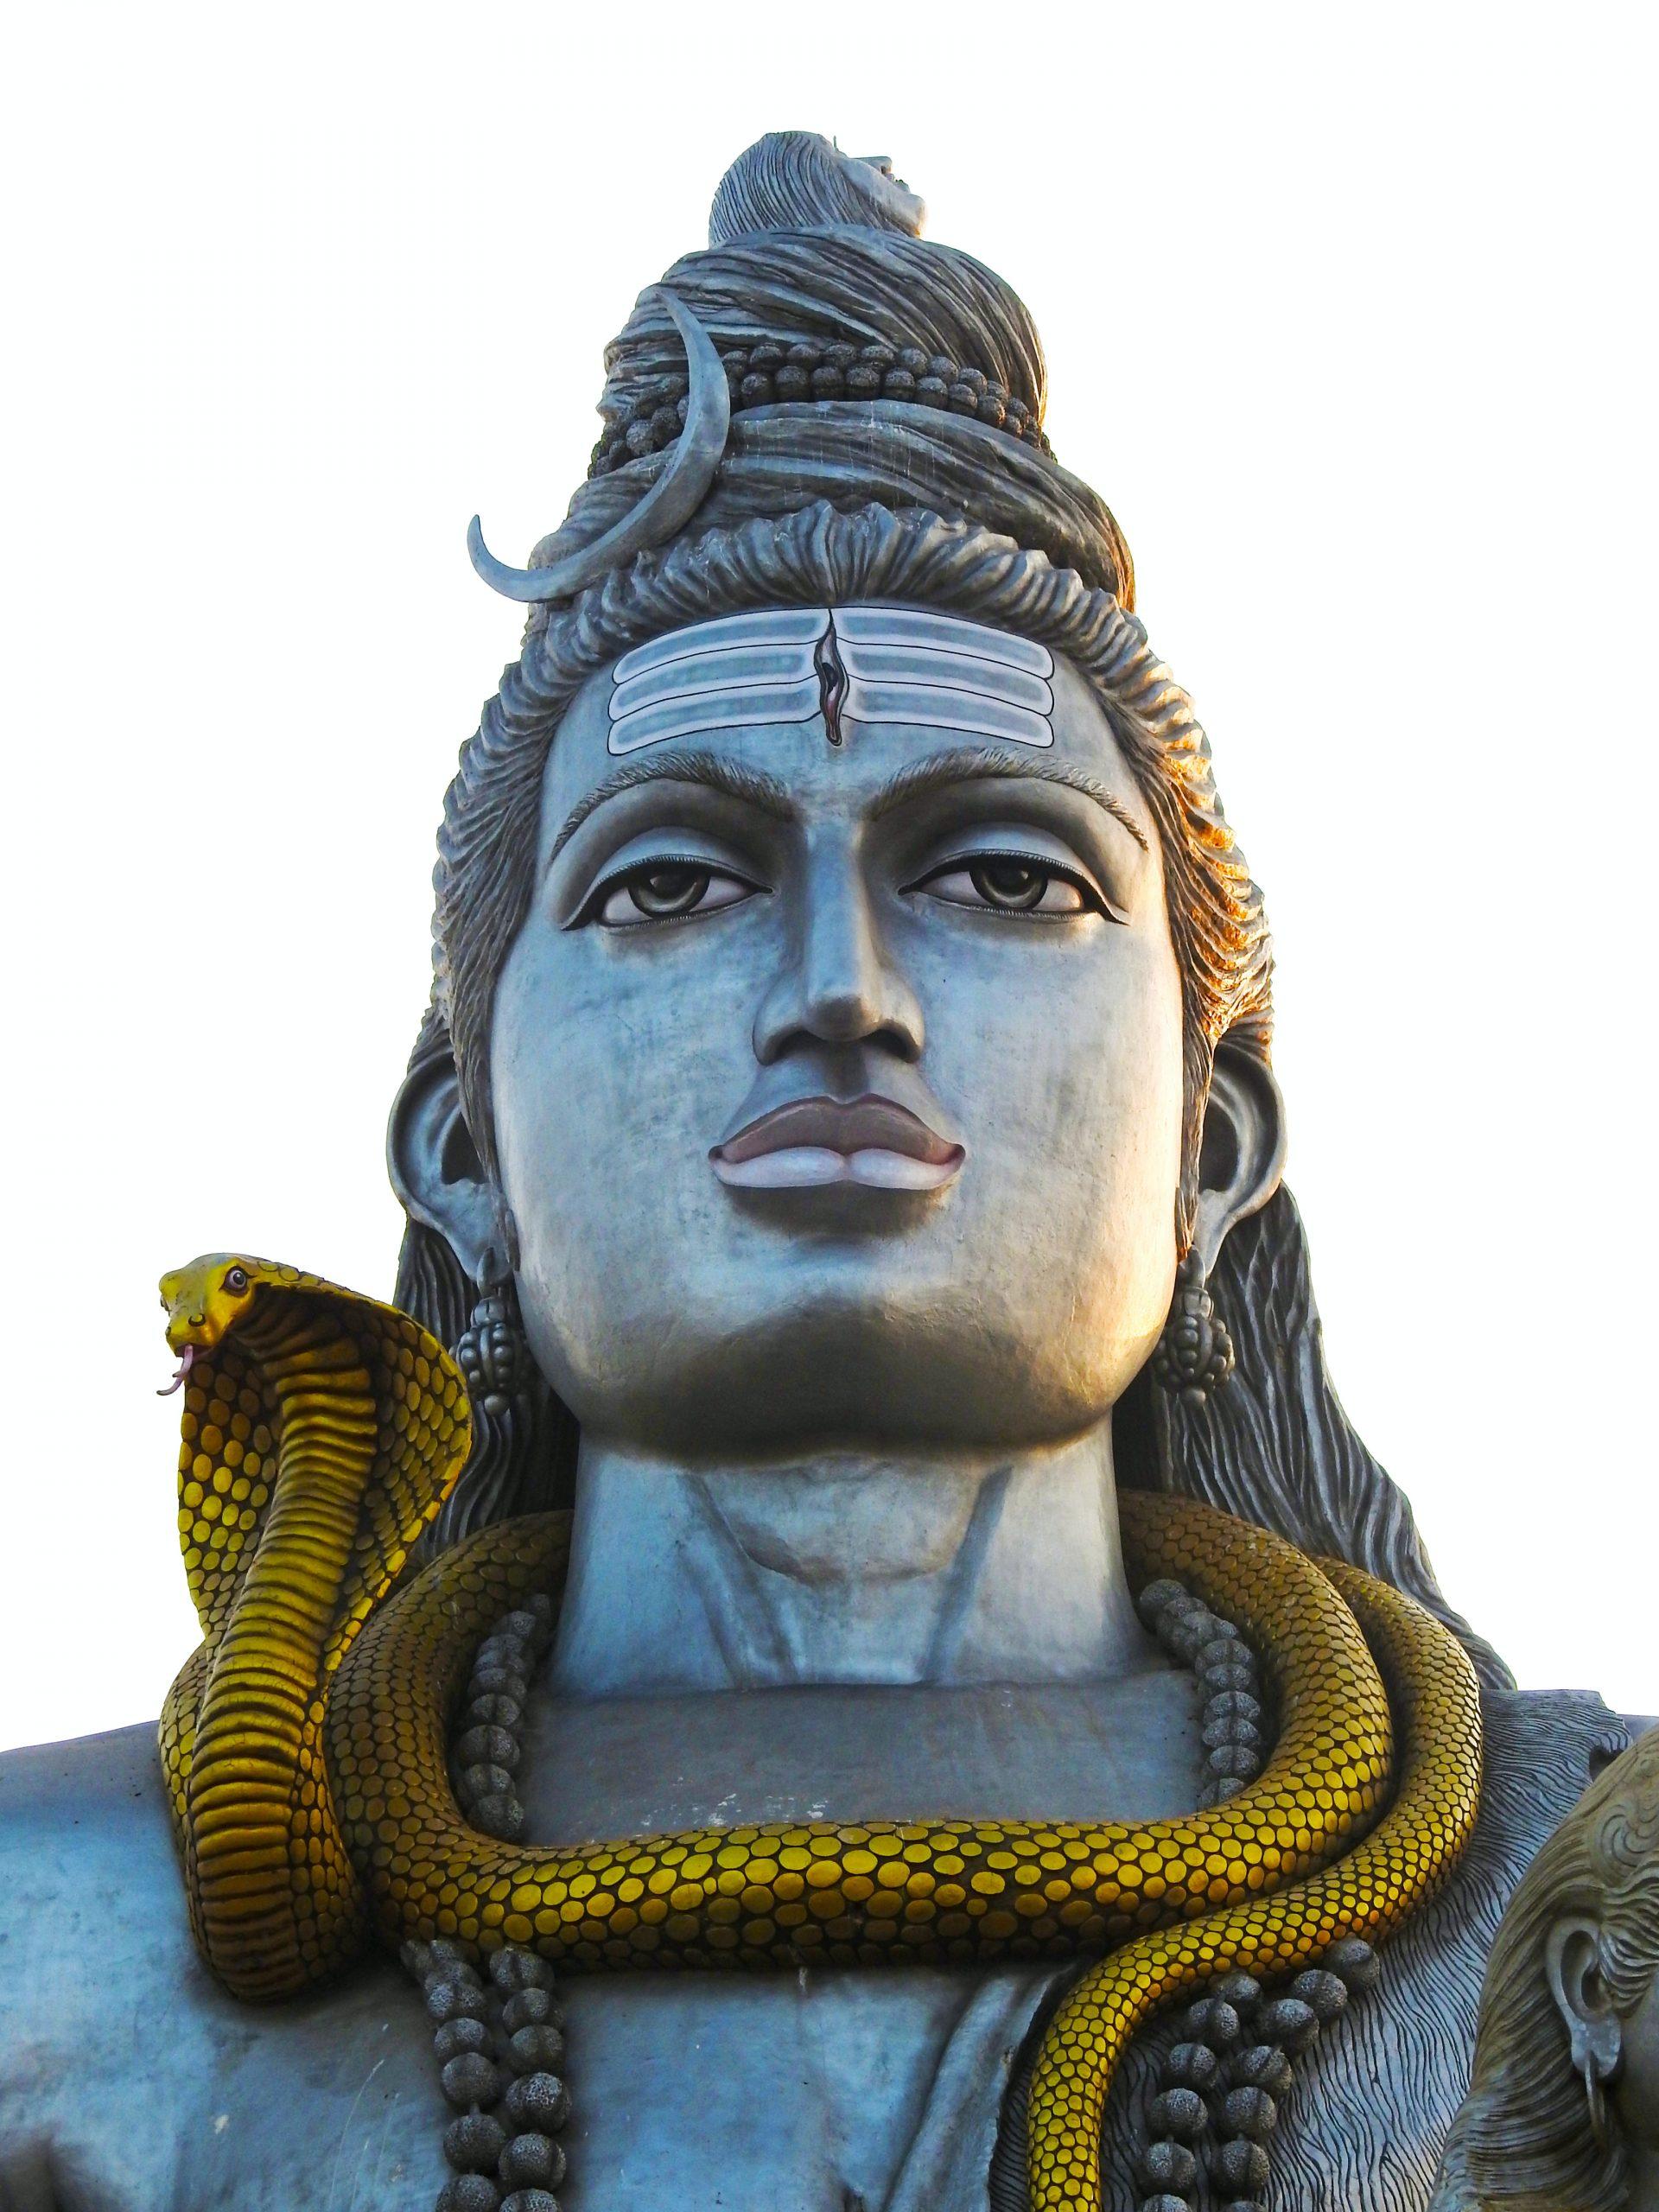 Mahashivratri Festival: Science or Religious?